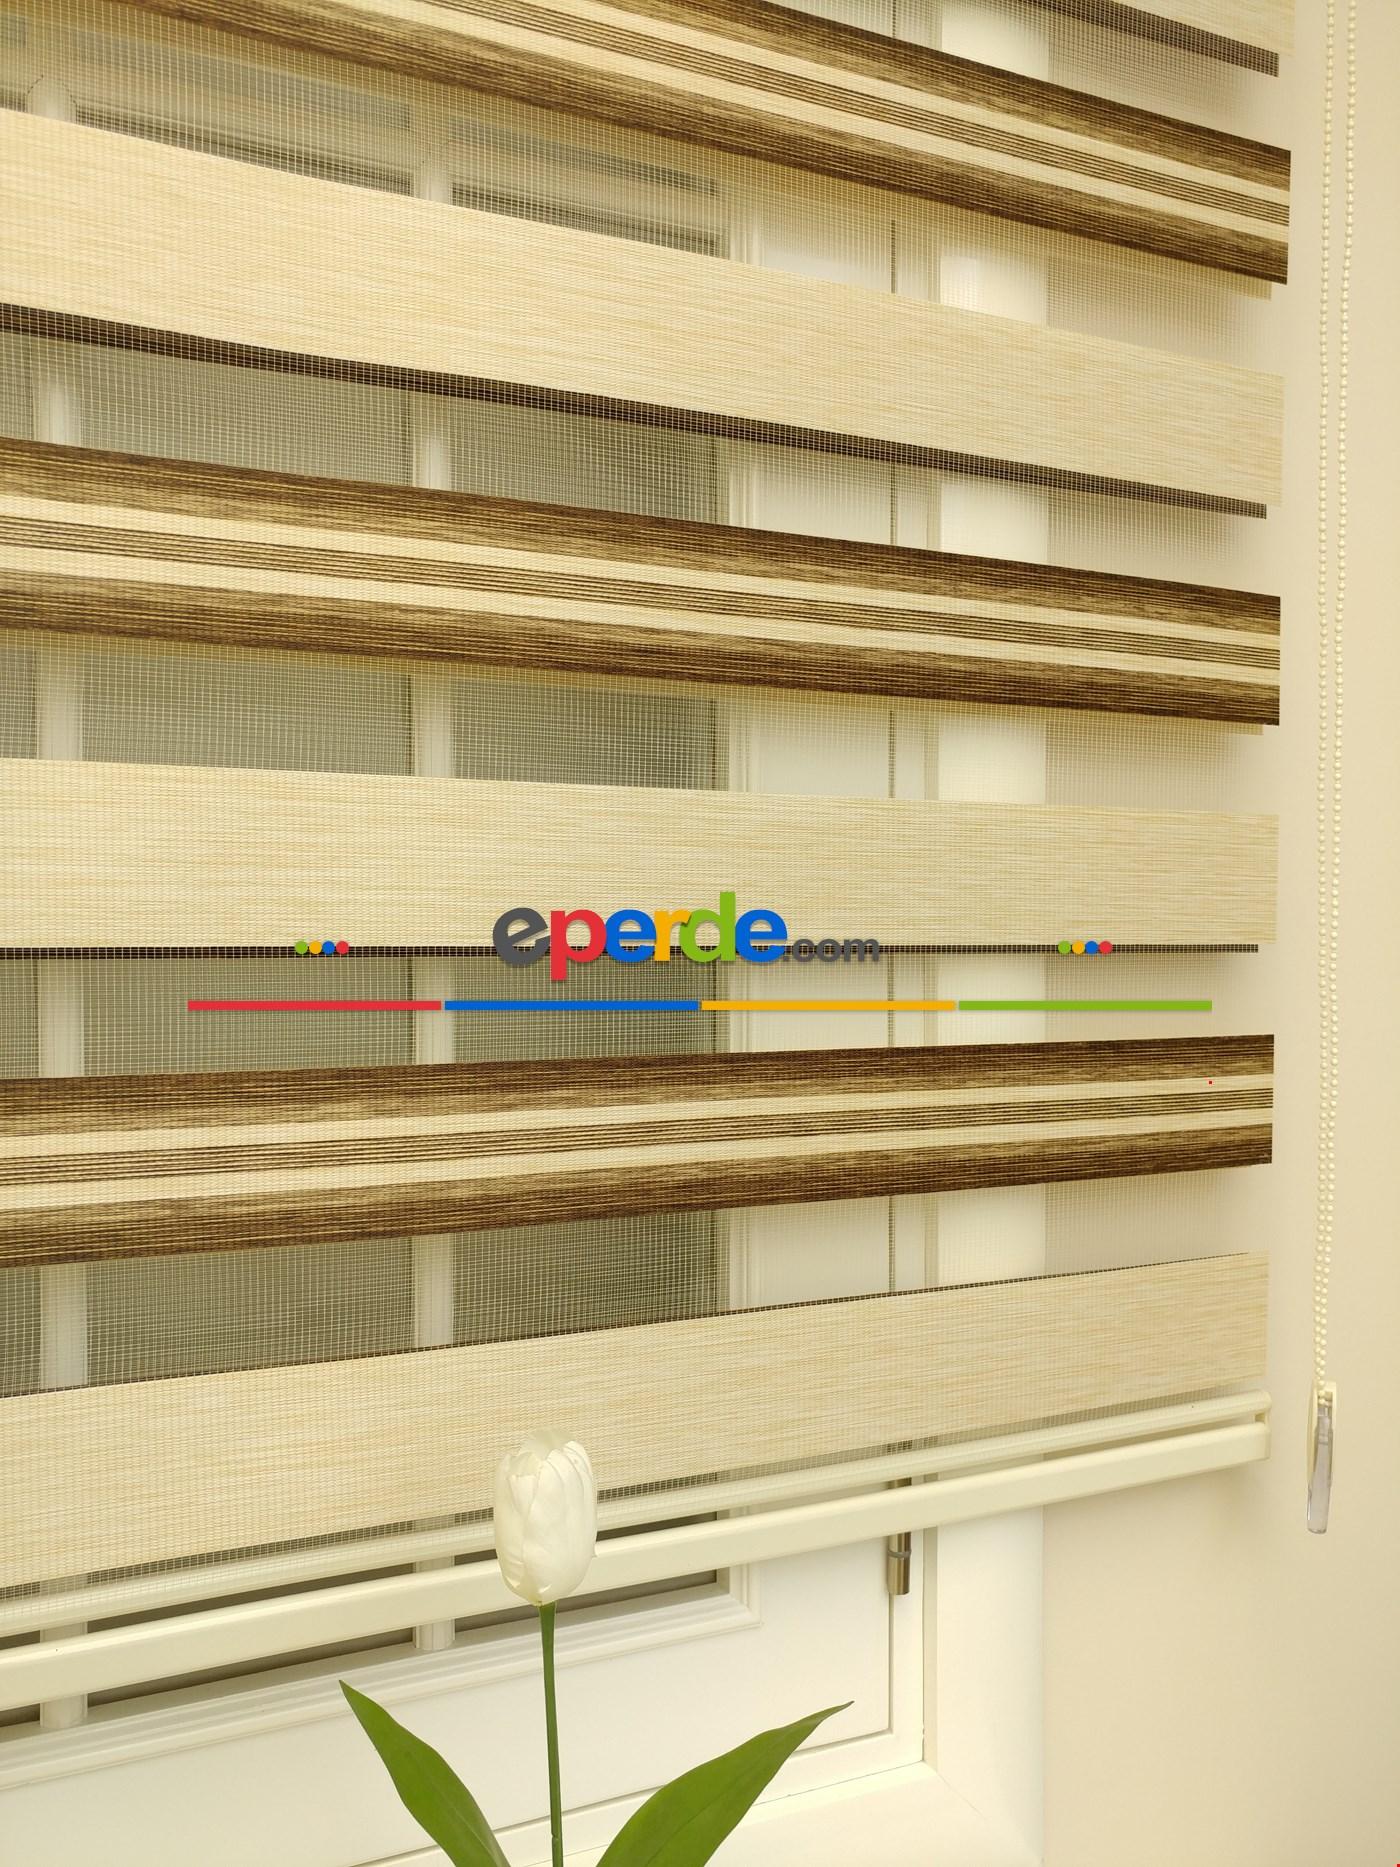 Zebra Perde - Caprice A.gri-antrazit Renk Bambu (geçiş Zeminli) Bej - Kahve Açık - Vizon Rengi